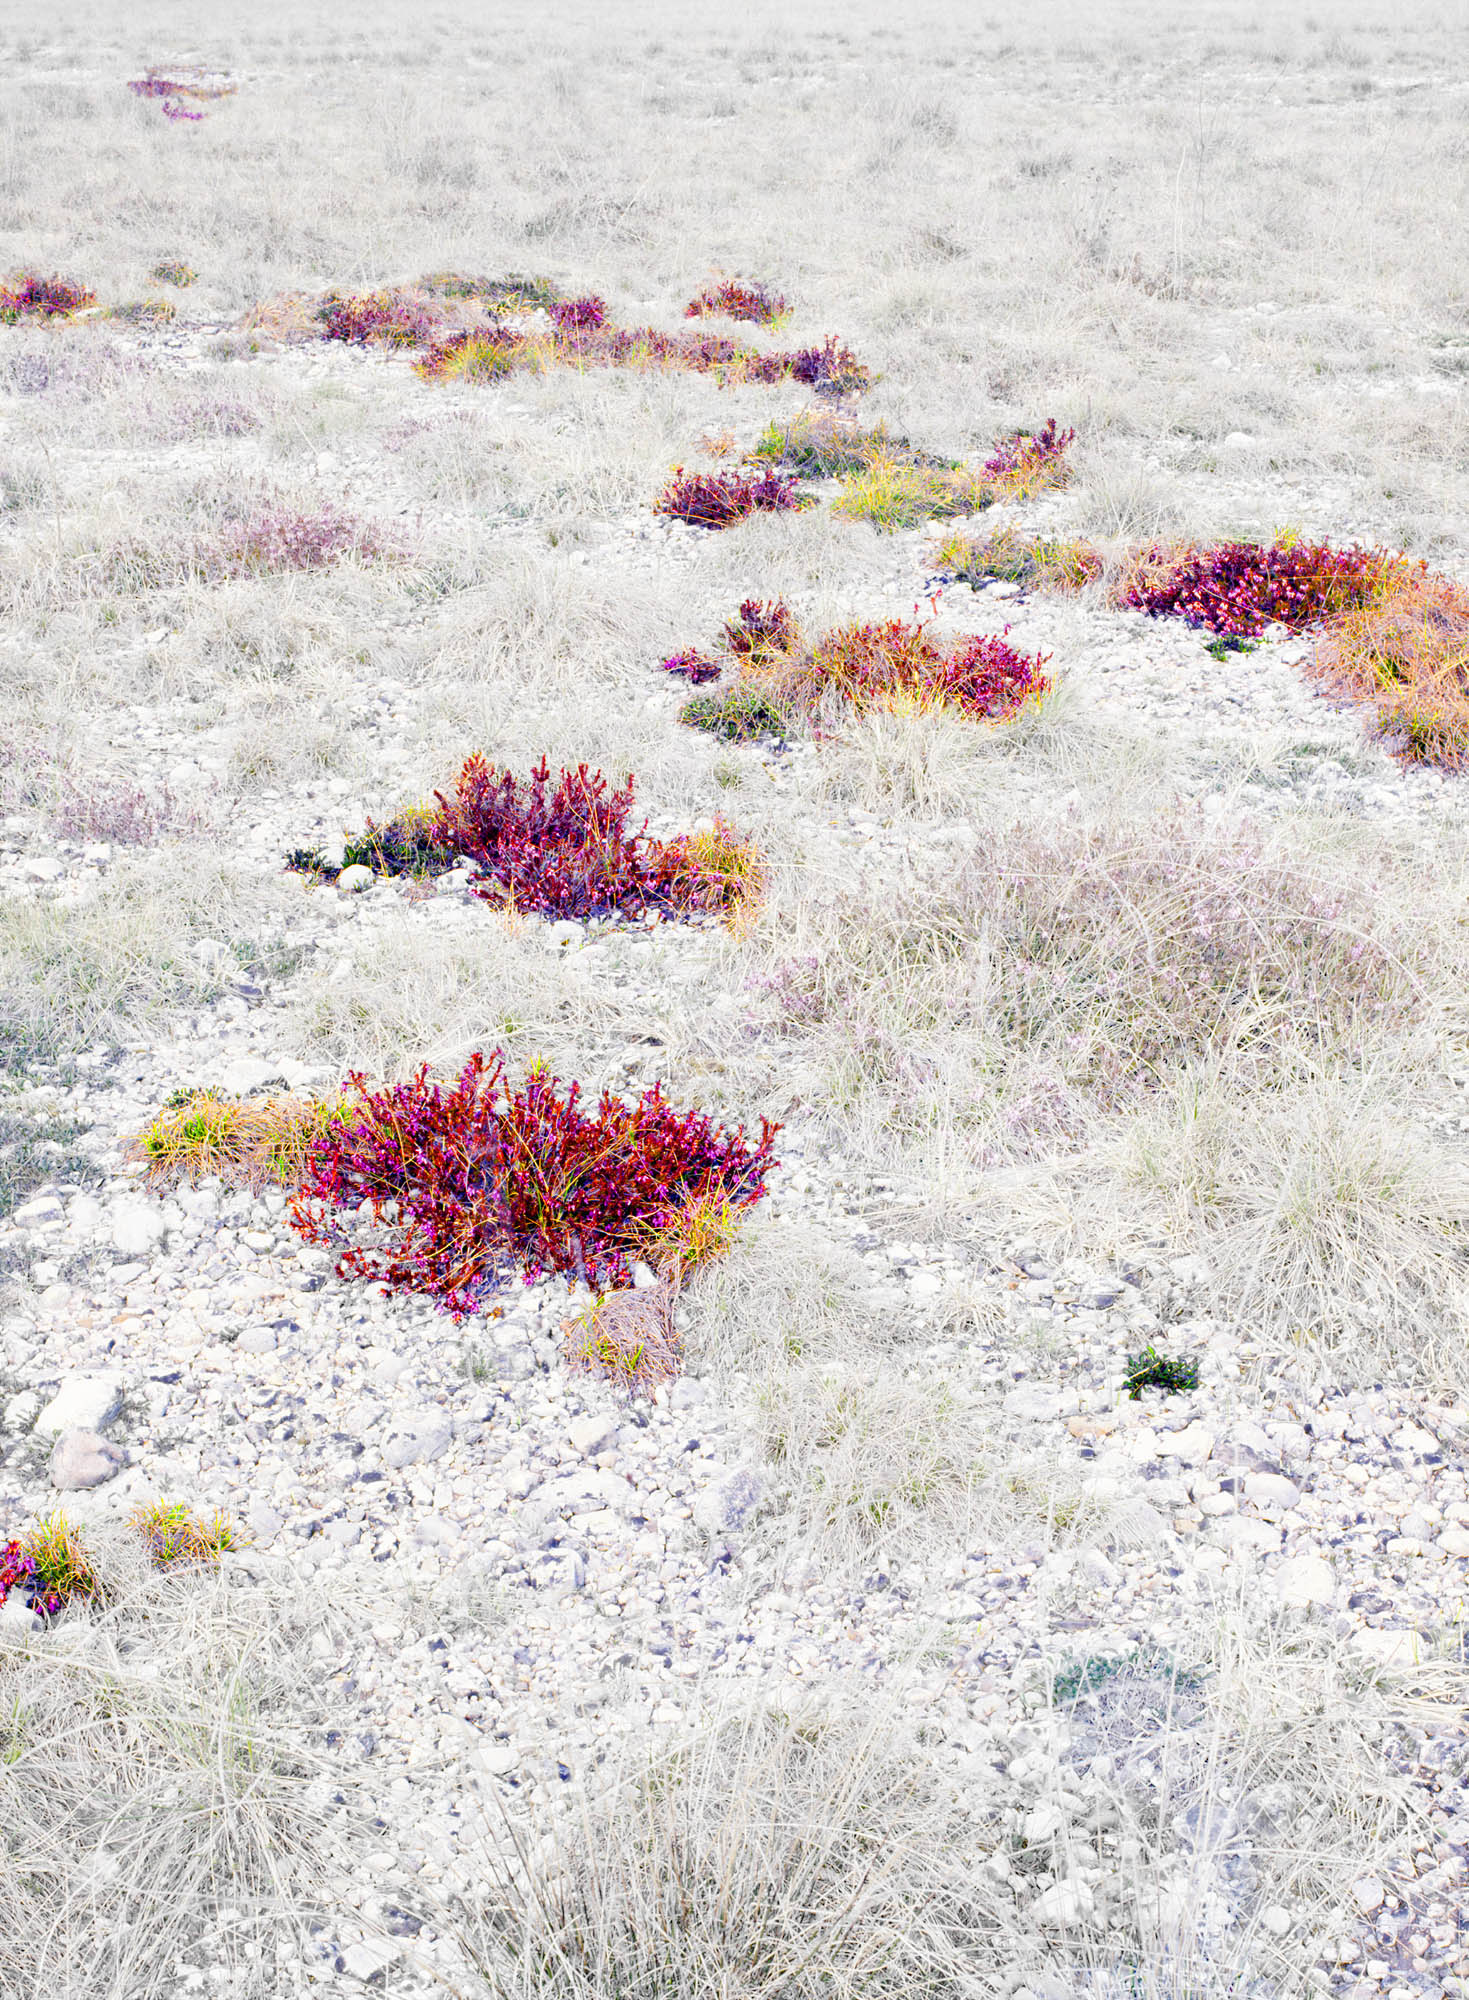 ANALYSIS OF THE HIDDEN FLOWERS.JPG